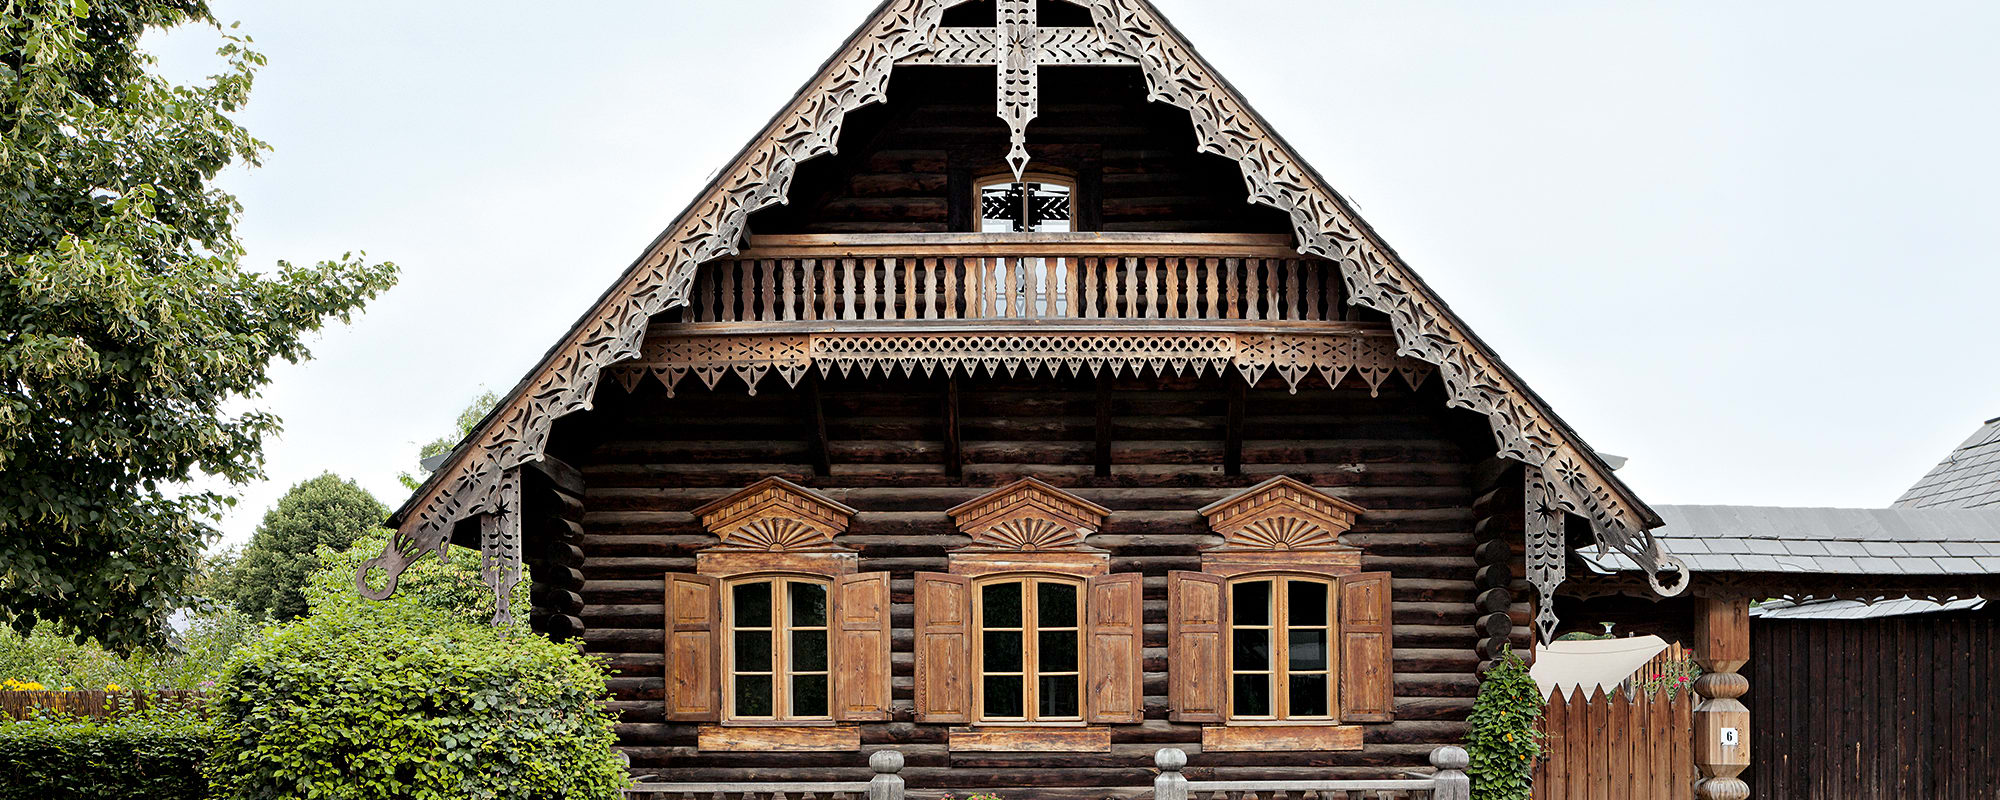 Architektur, Holz, Haus, Potsdamer Kolonie, Alexandrowka